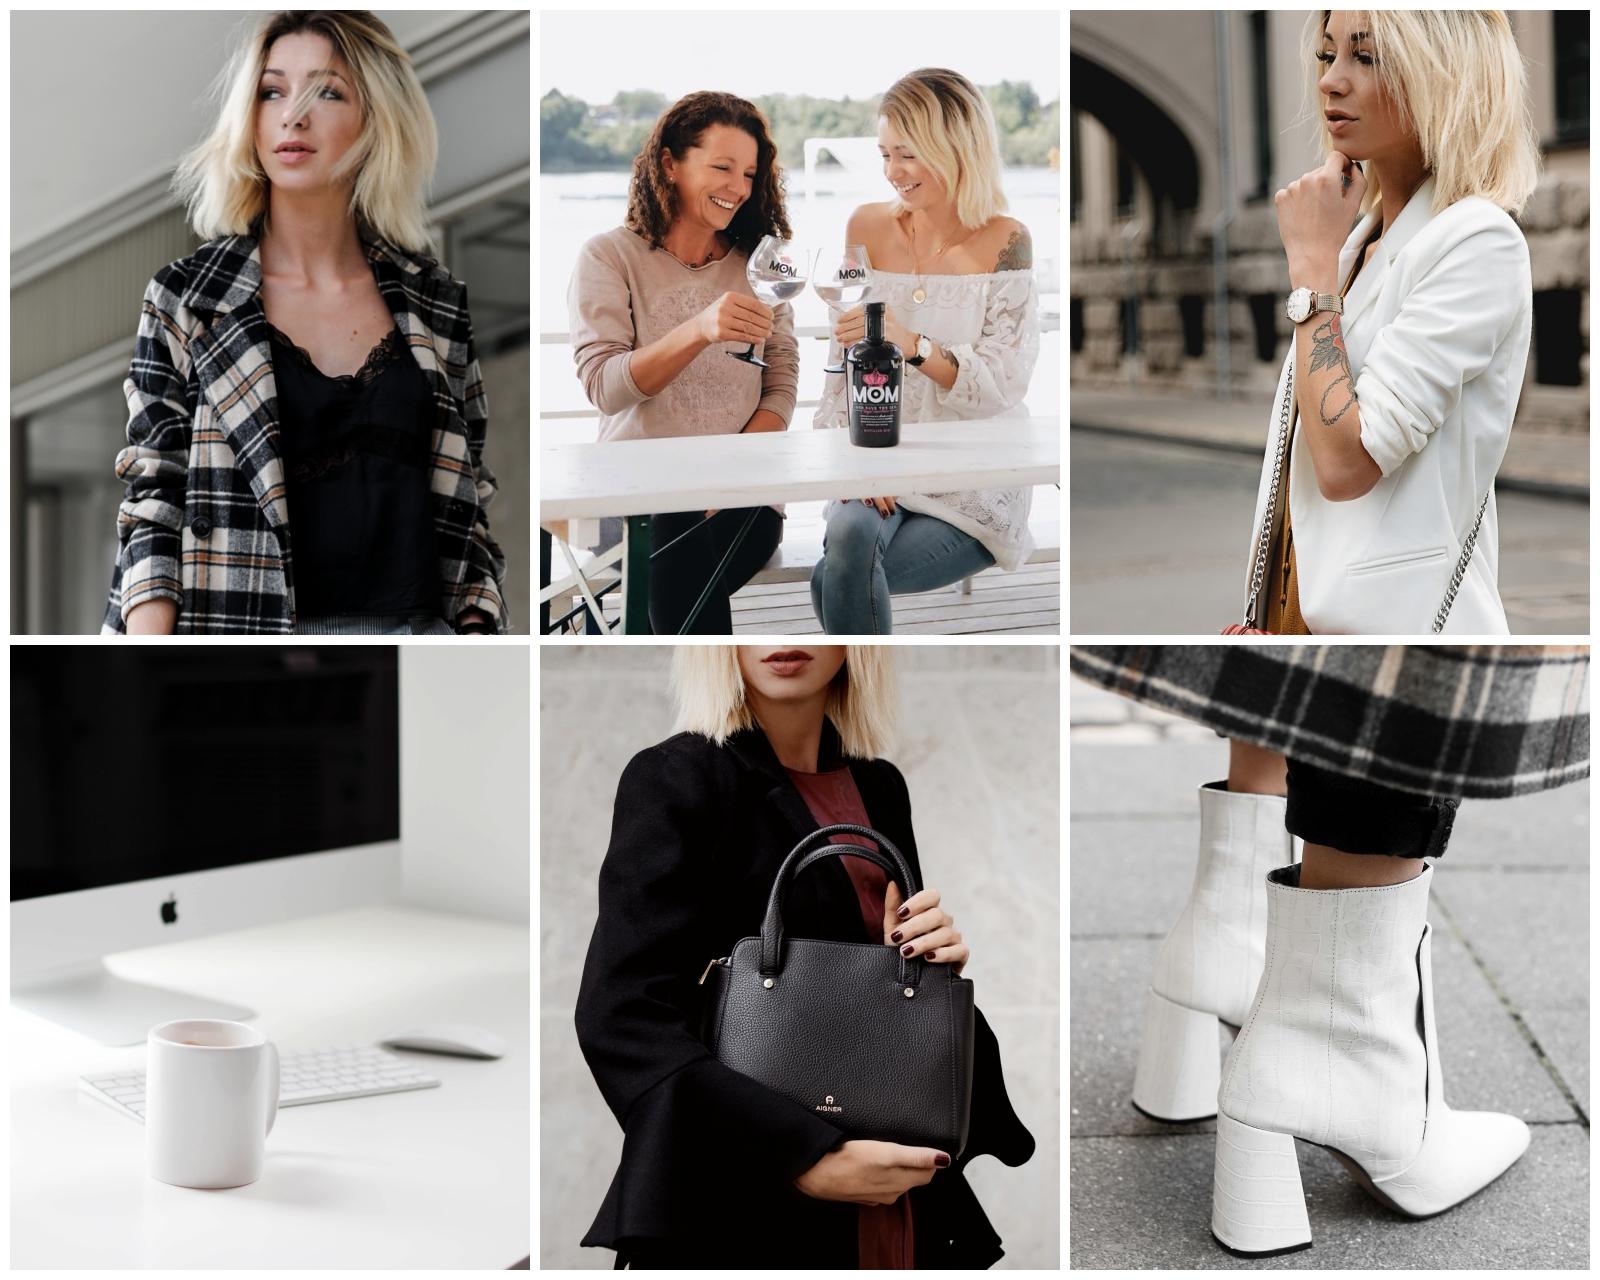 modeblogger-deutsch-fashionblog-germany-high-quality-influencer